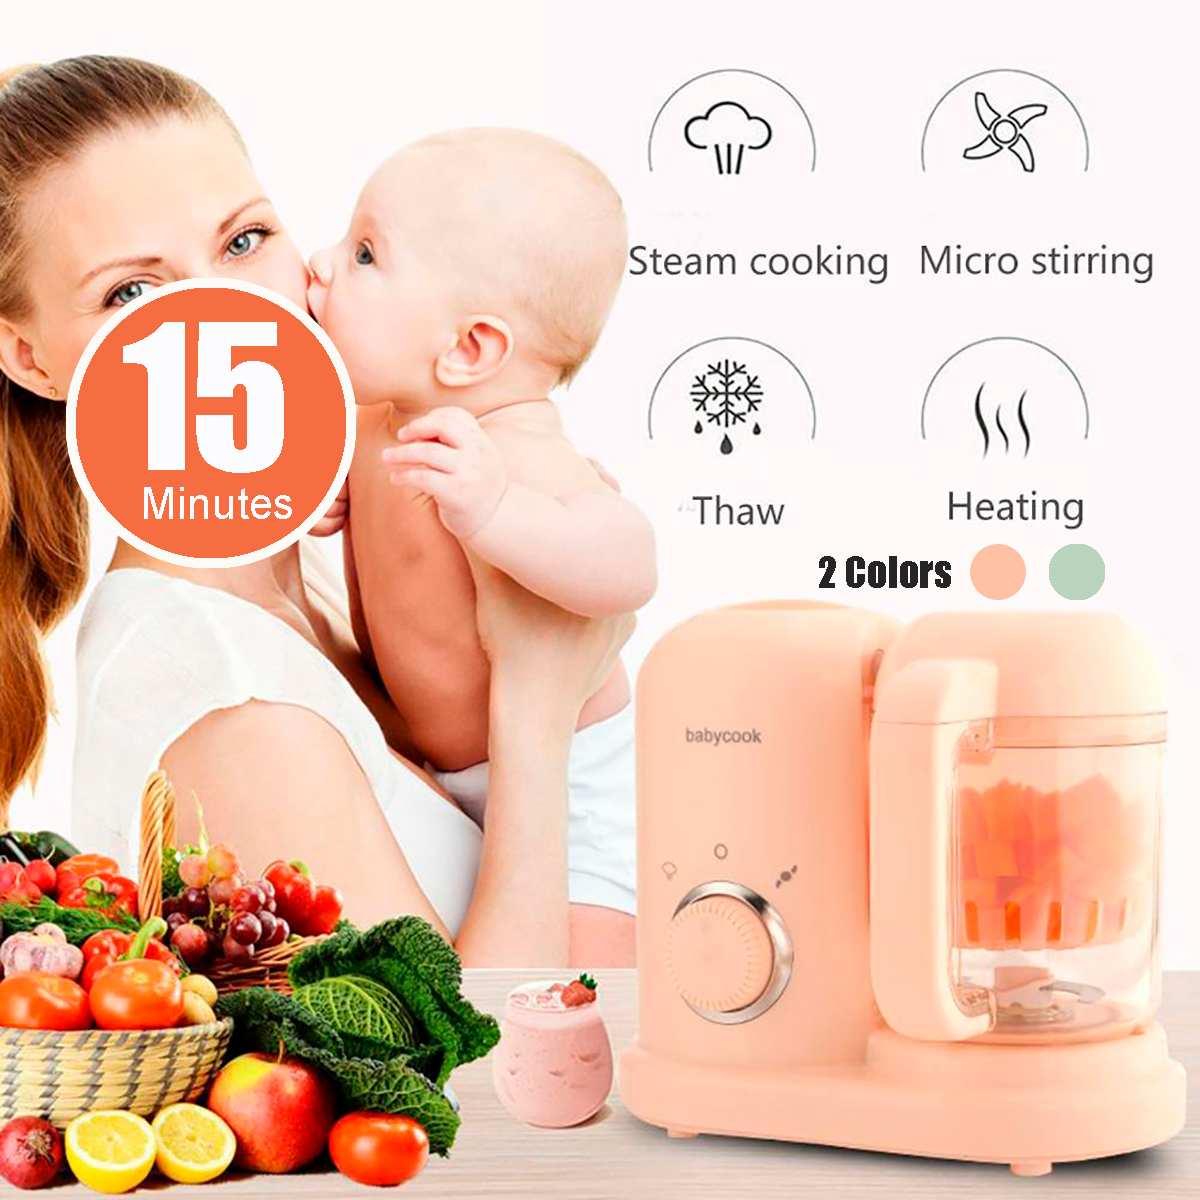 Baby Food Maker Electric Children Food Cooking Maker Steamer Mixing Juicing Stirring Grinder Blenders Processor Multifunction